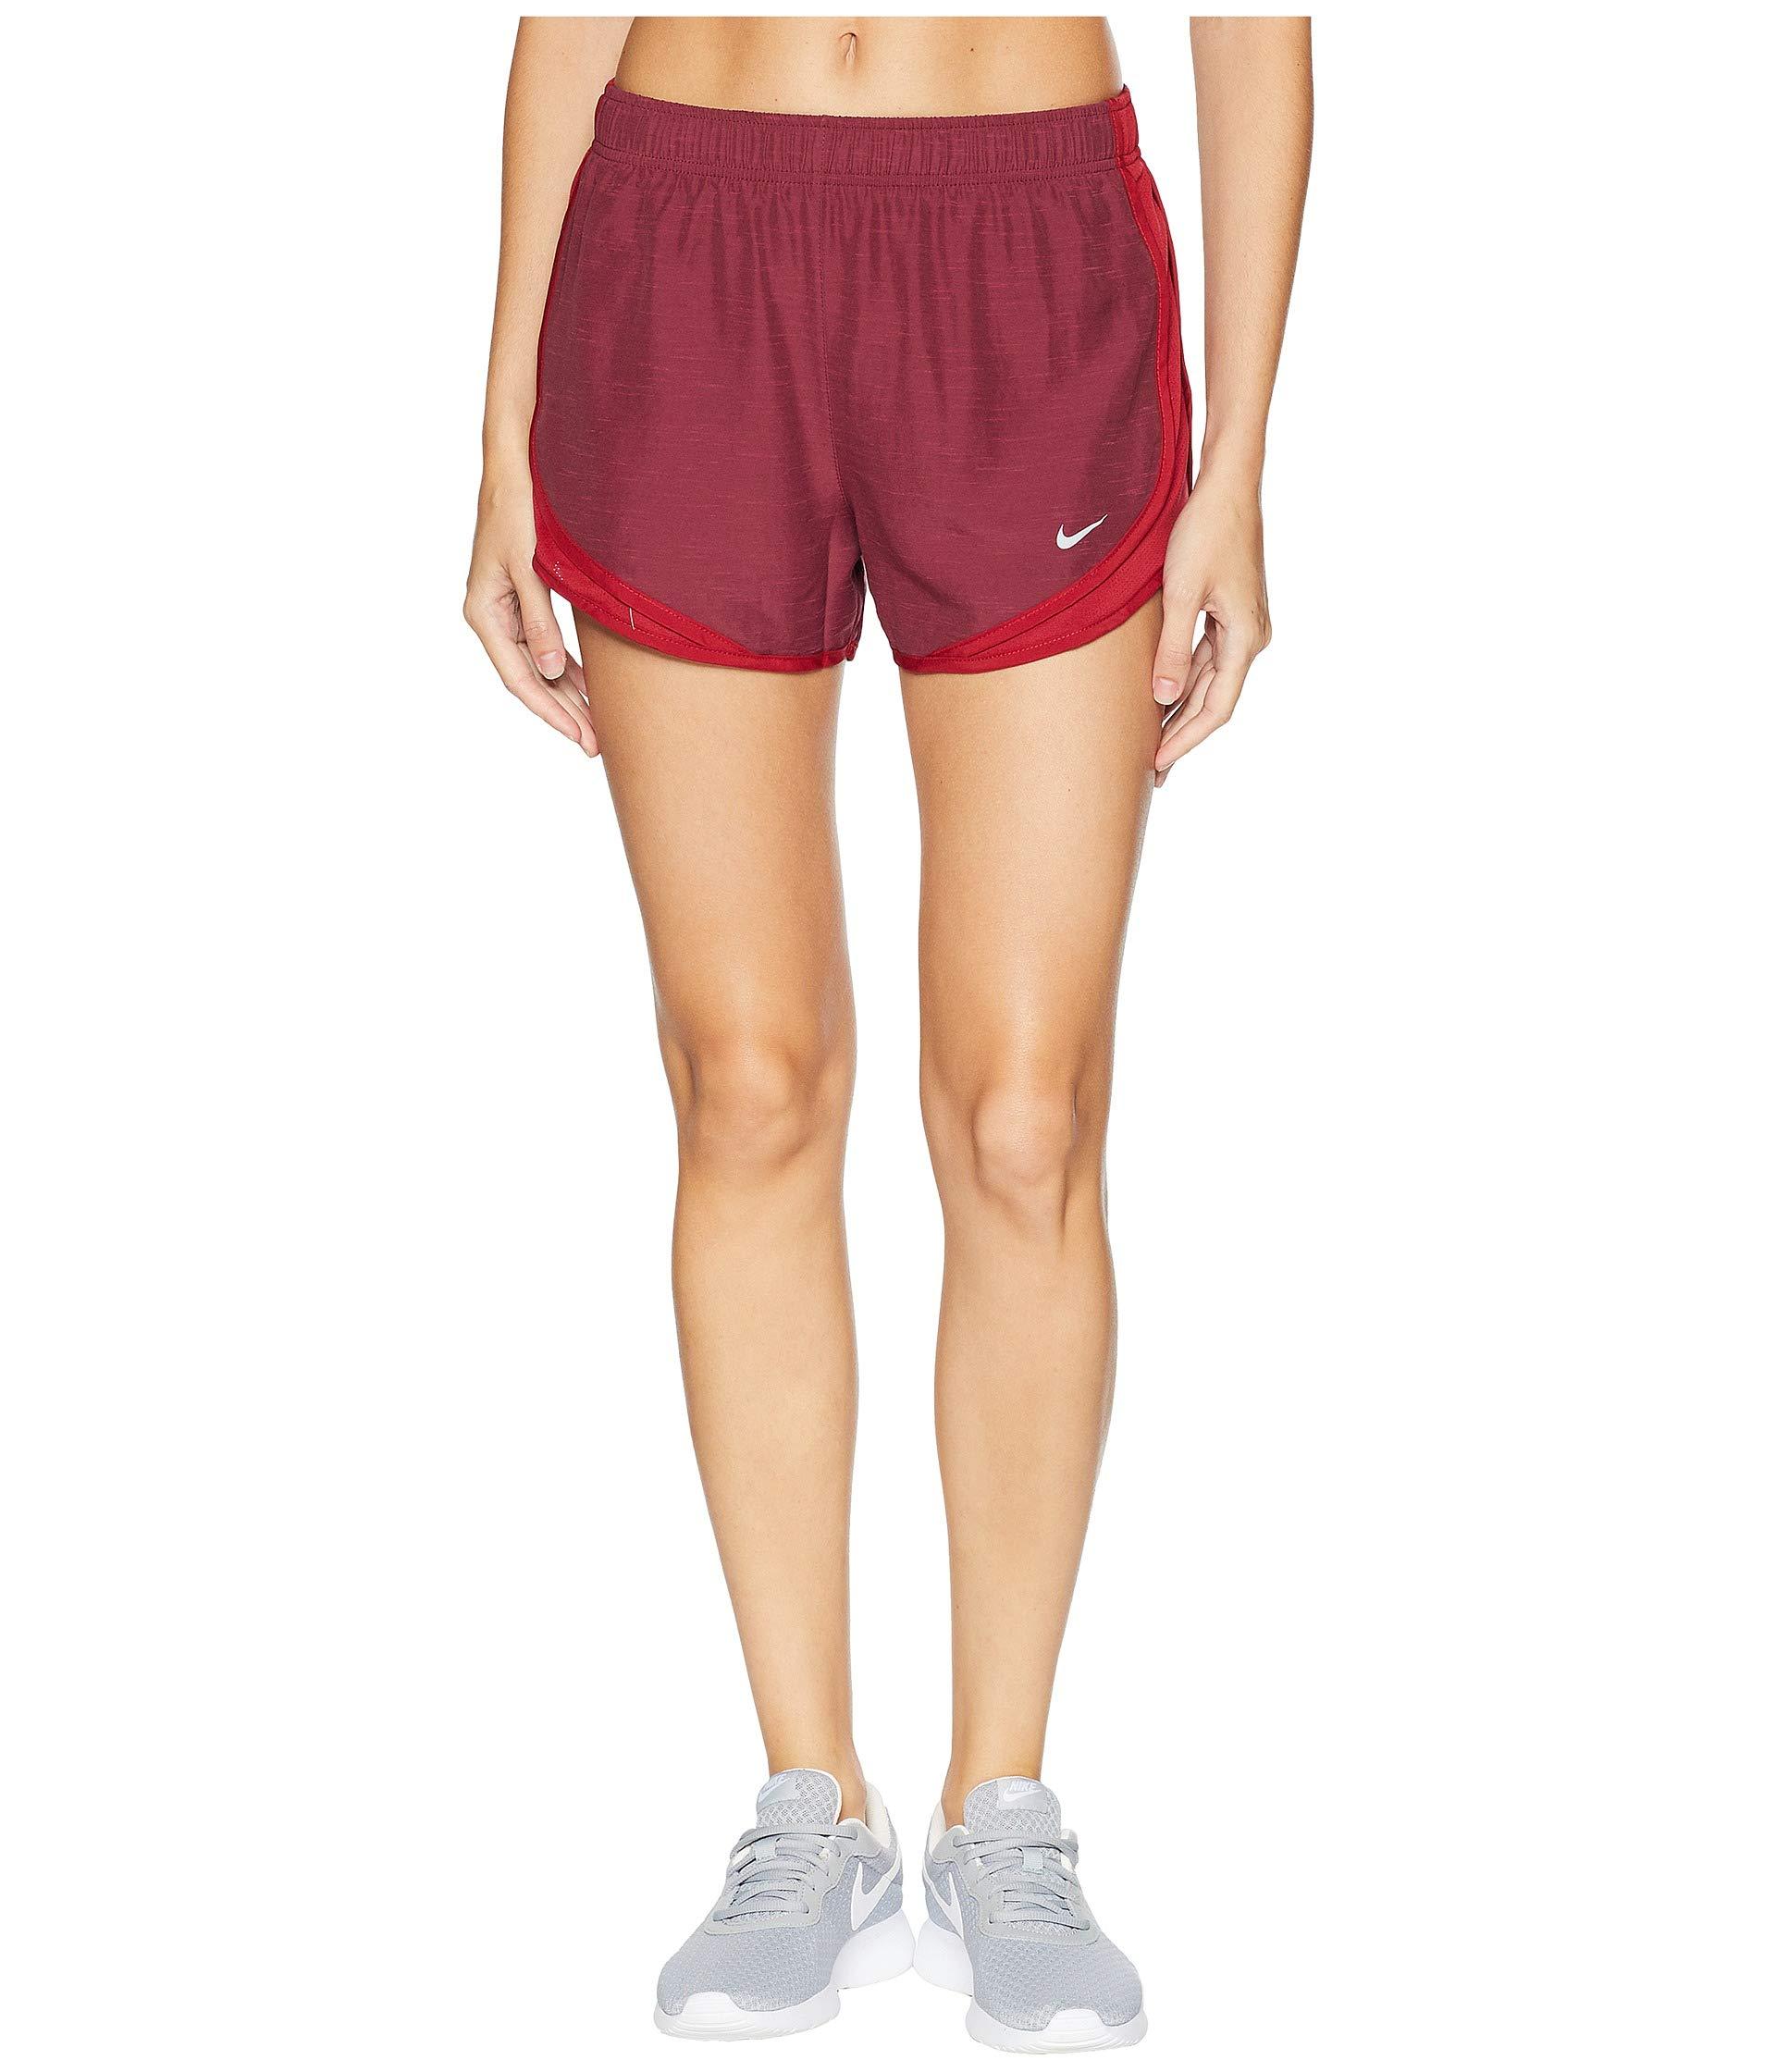 Nike Women's Dry Tempo Short Red Crush/Red Crush/Red Crush/Wolf Grey X-Small 3 by Nike